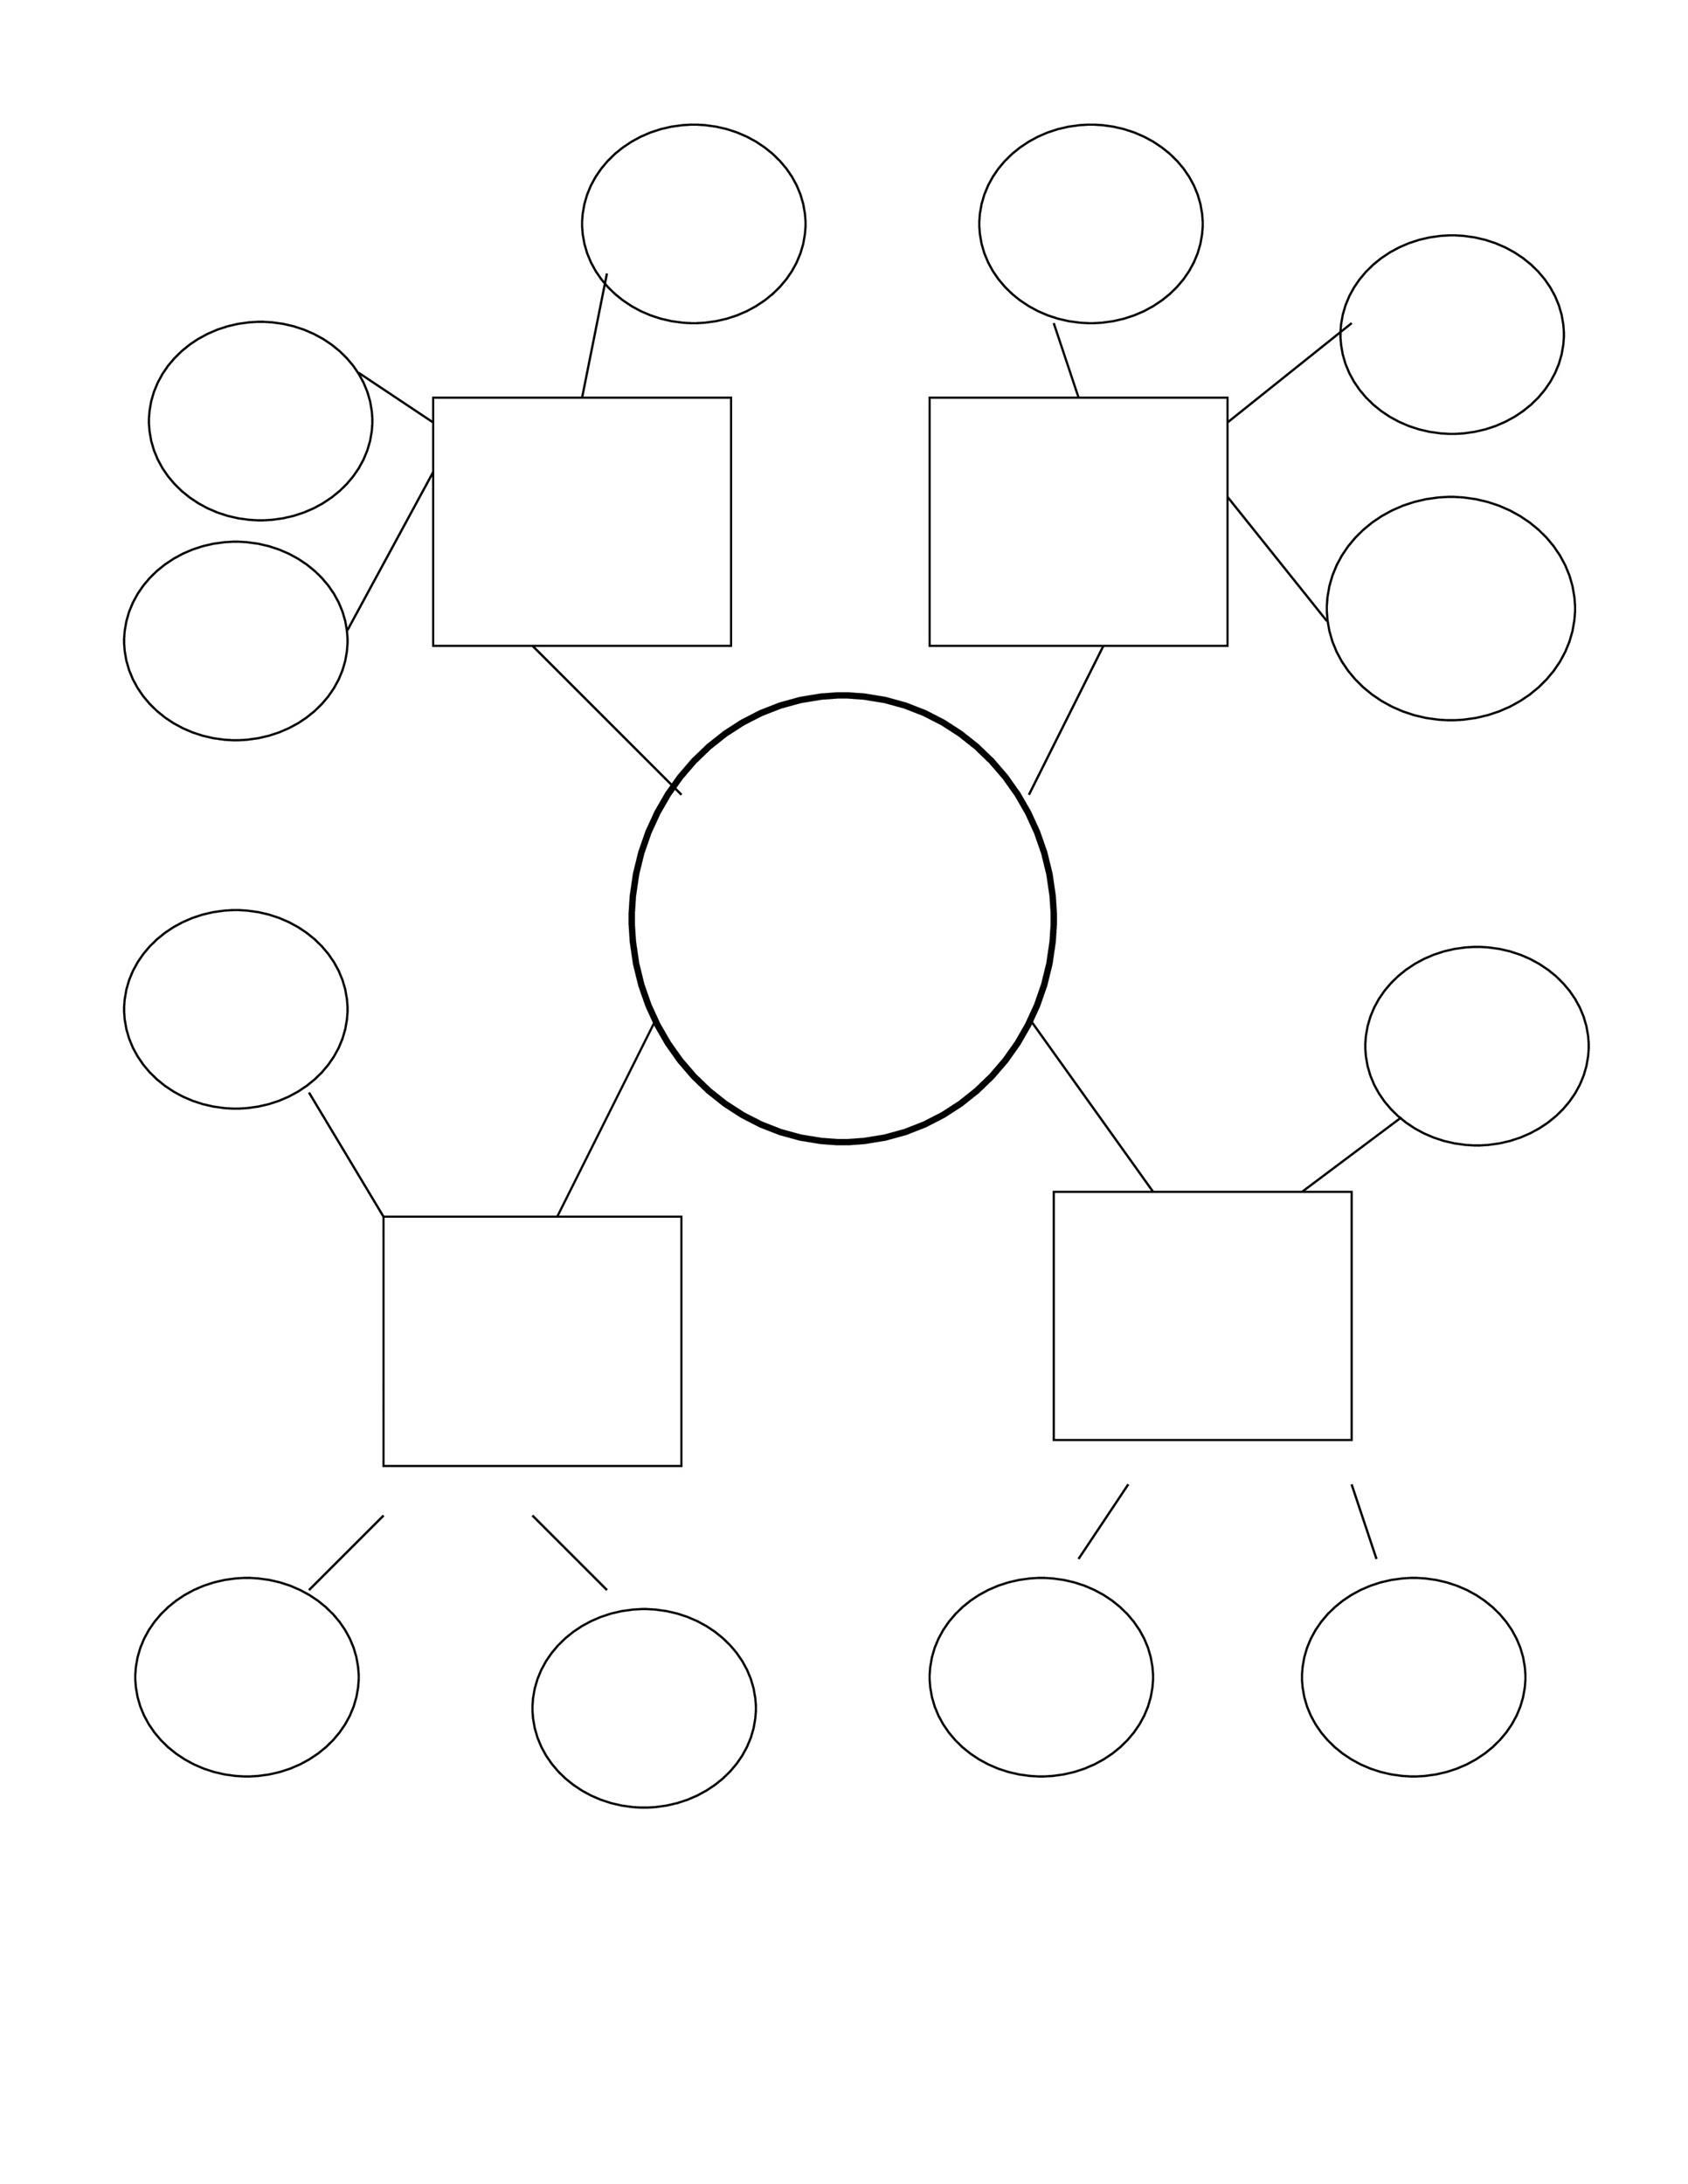 010 Remarkable Free Blank Concept Map Template Sample  Printable NursingFull